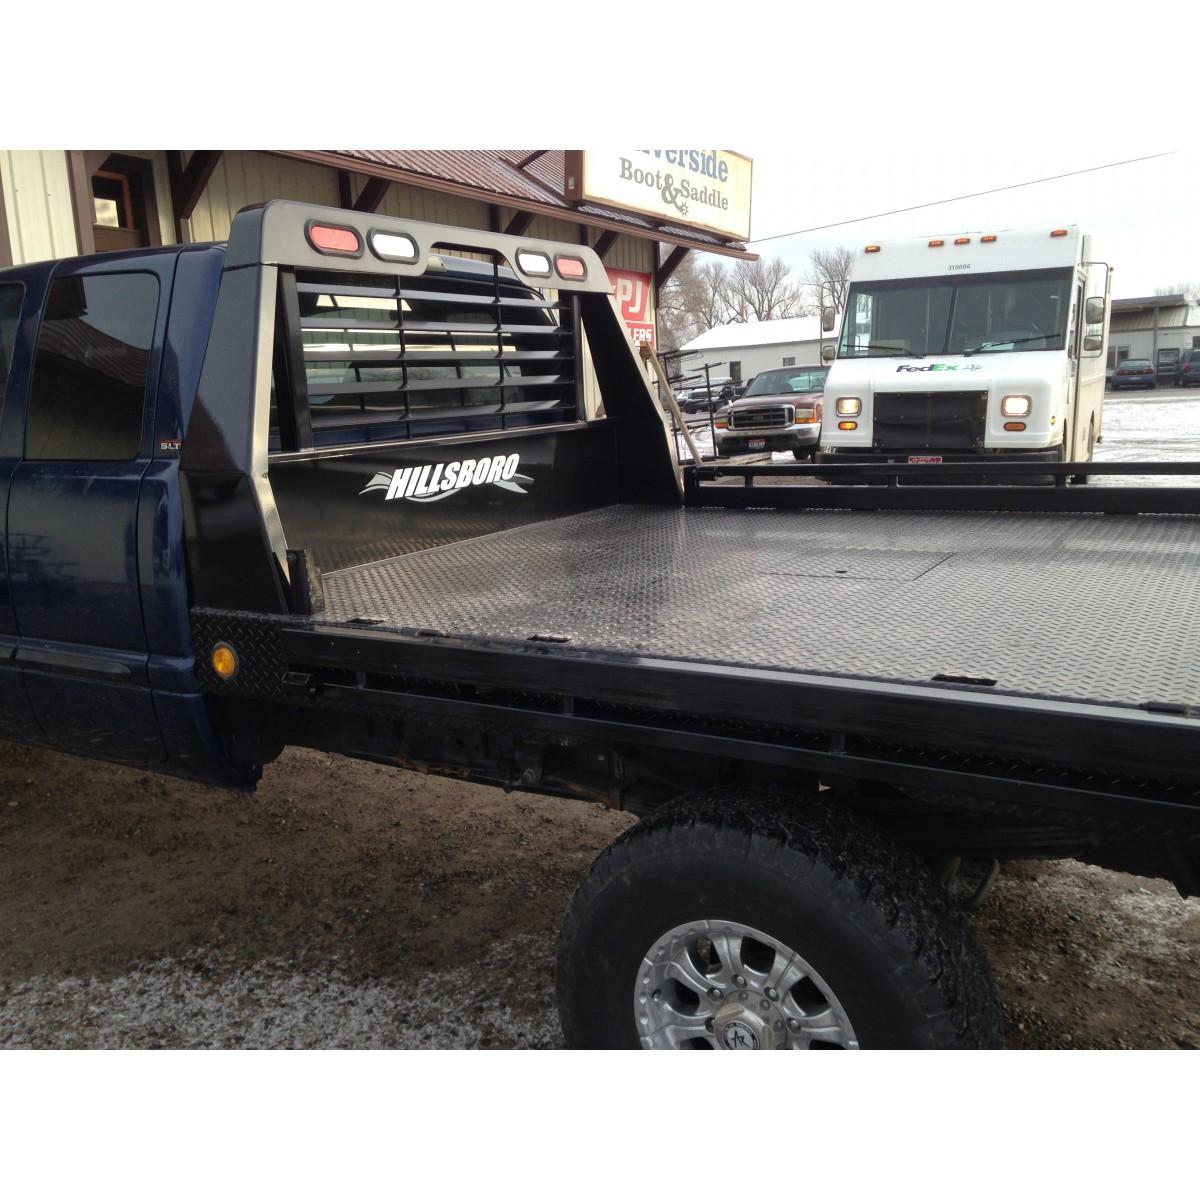 dodge trailer hitch 1992 ezgo marathon wiring diagram hillsboro gii steel bed - g ii pickup flatbeds/bumpers